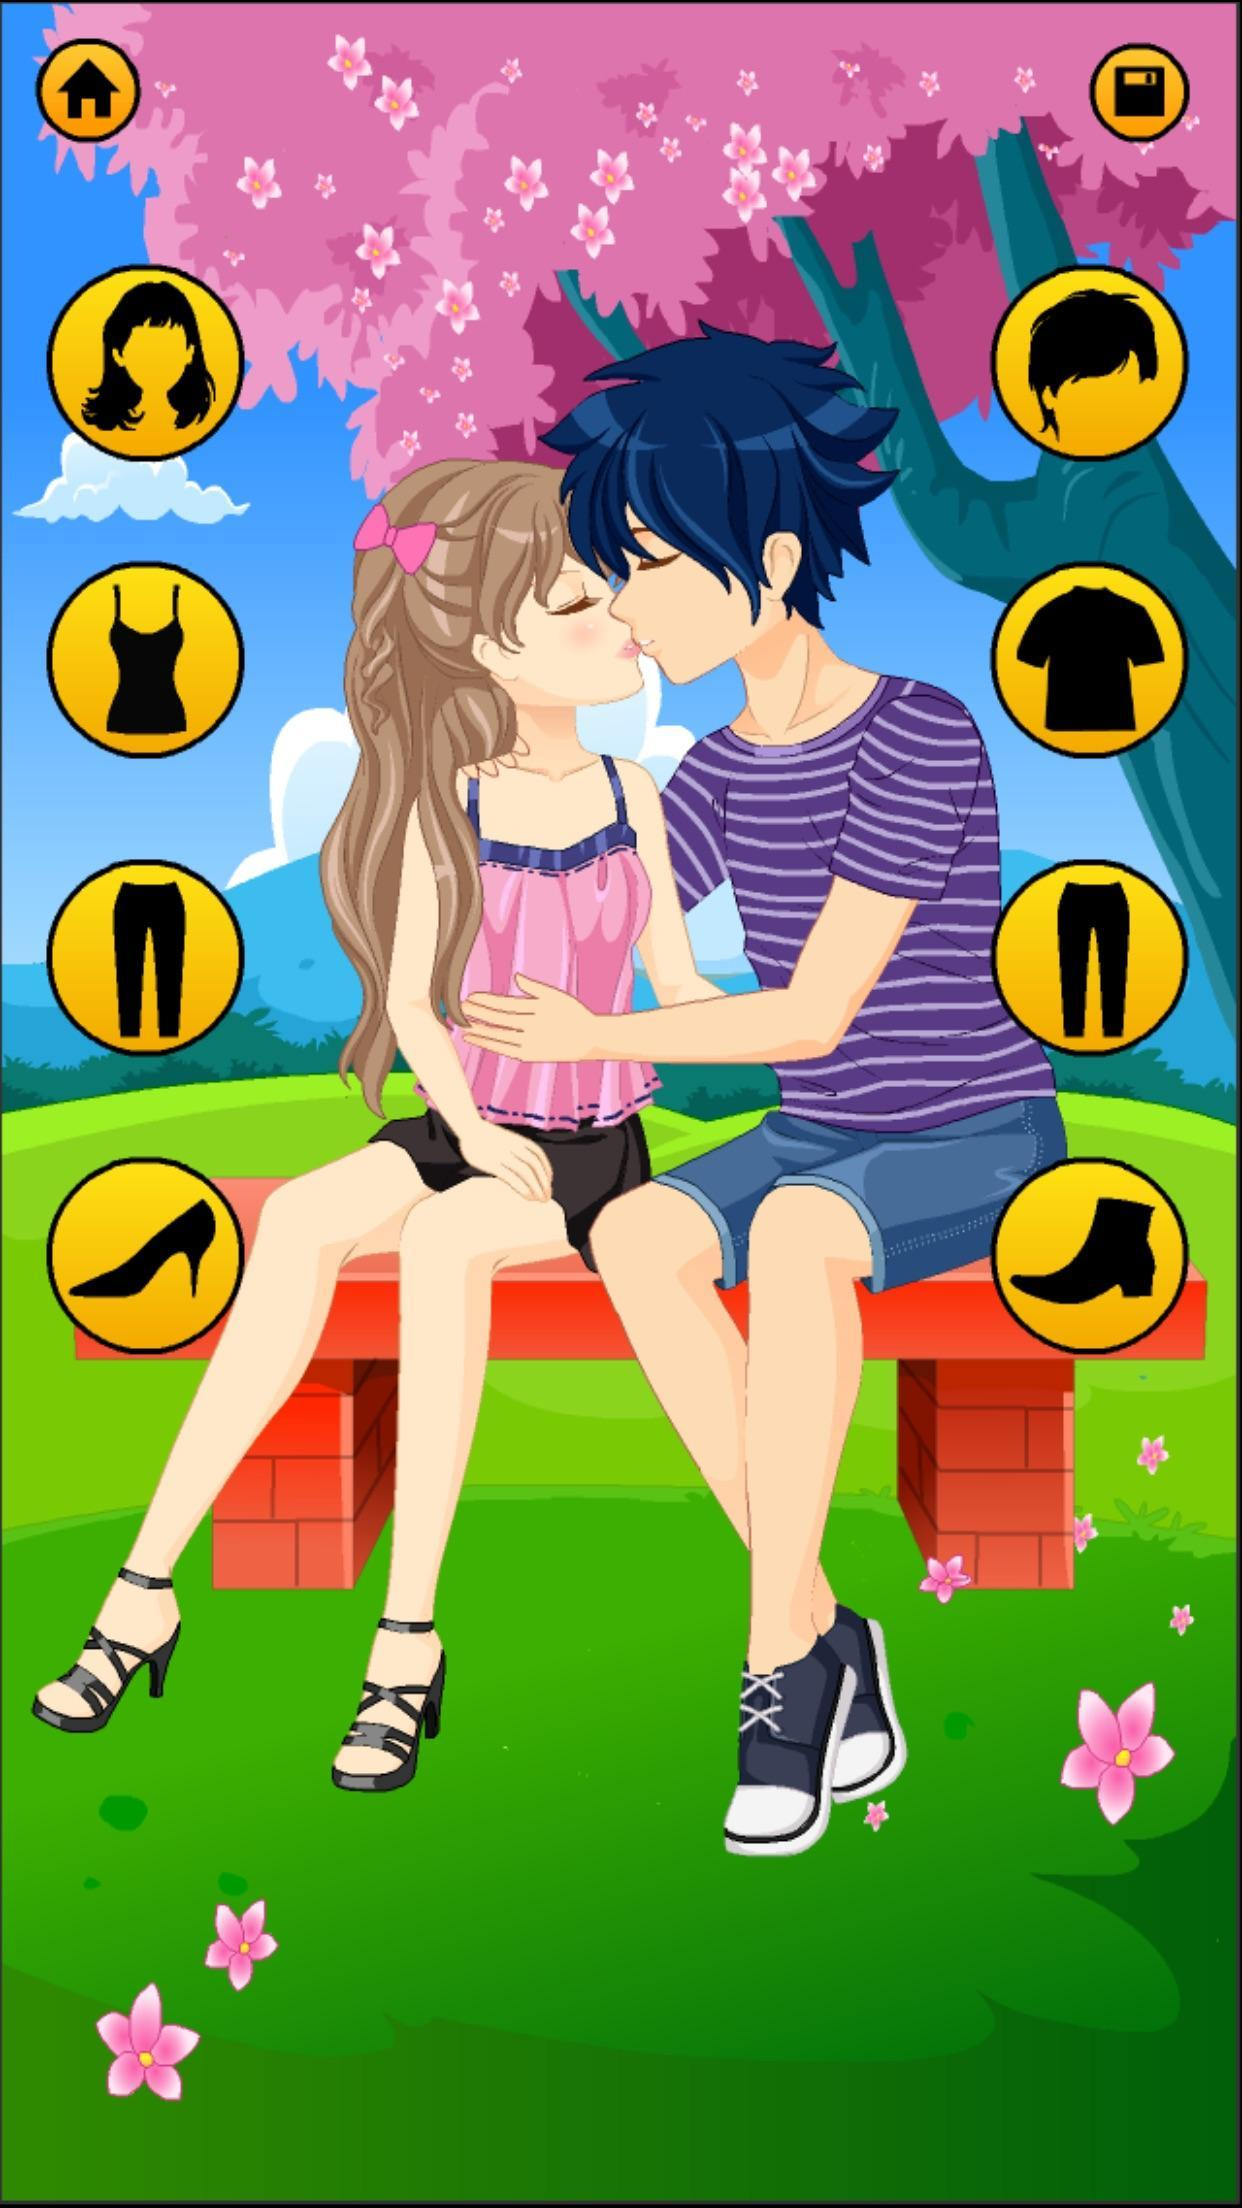 Anime Dress Up Games For Girls - Couple Love Kiss 3.3 Screenshot 21